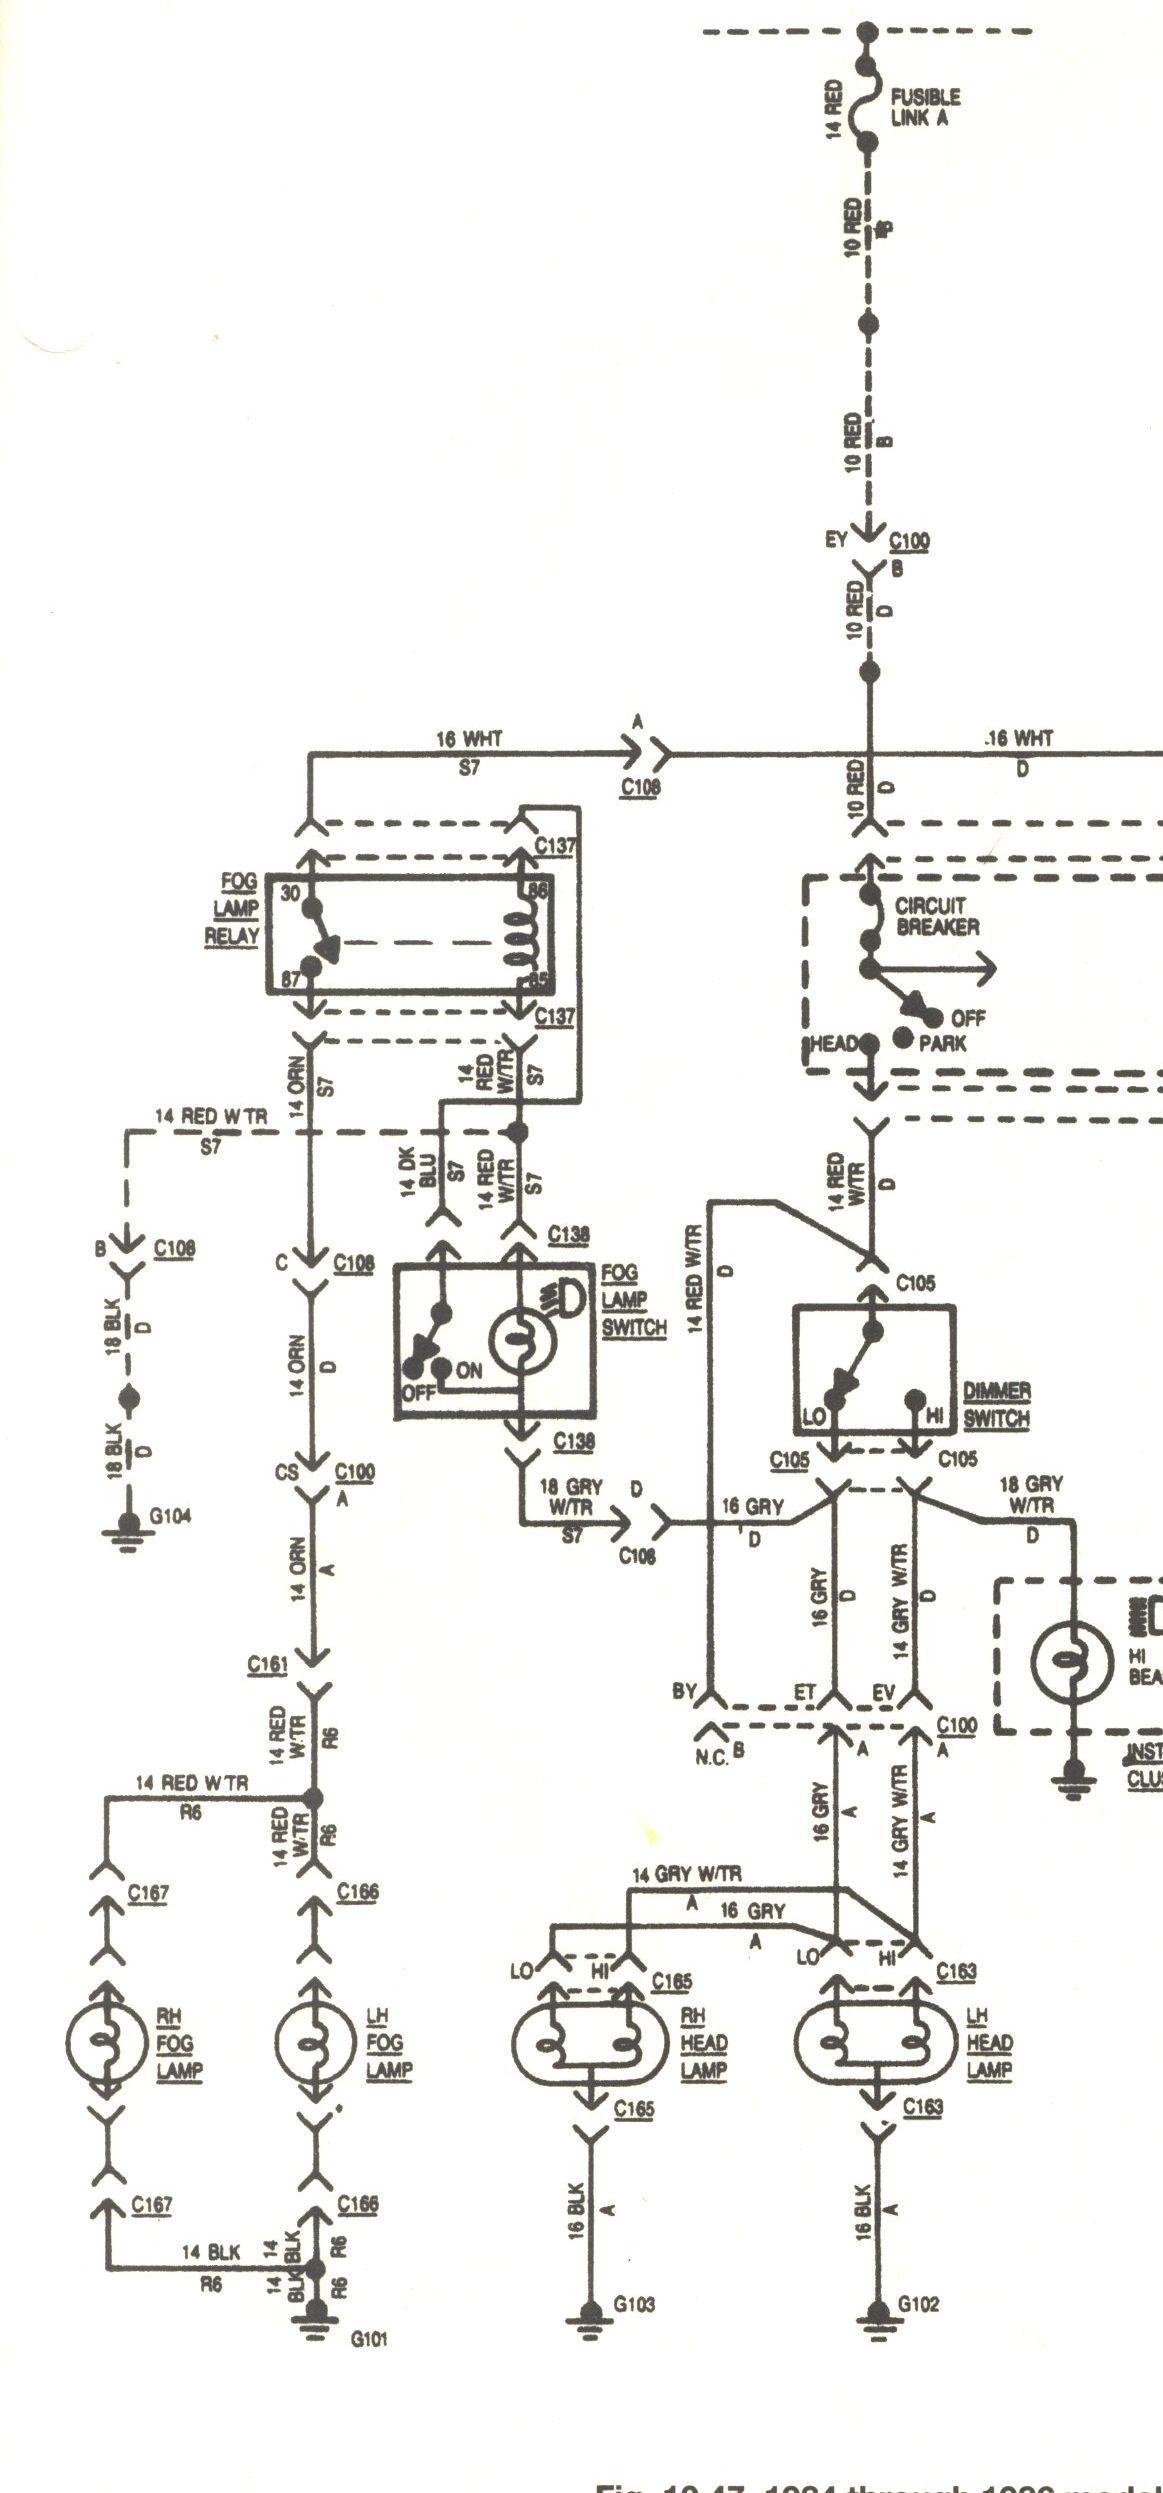 drivinglightschematic.jpg